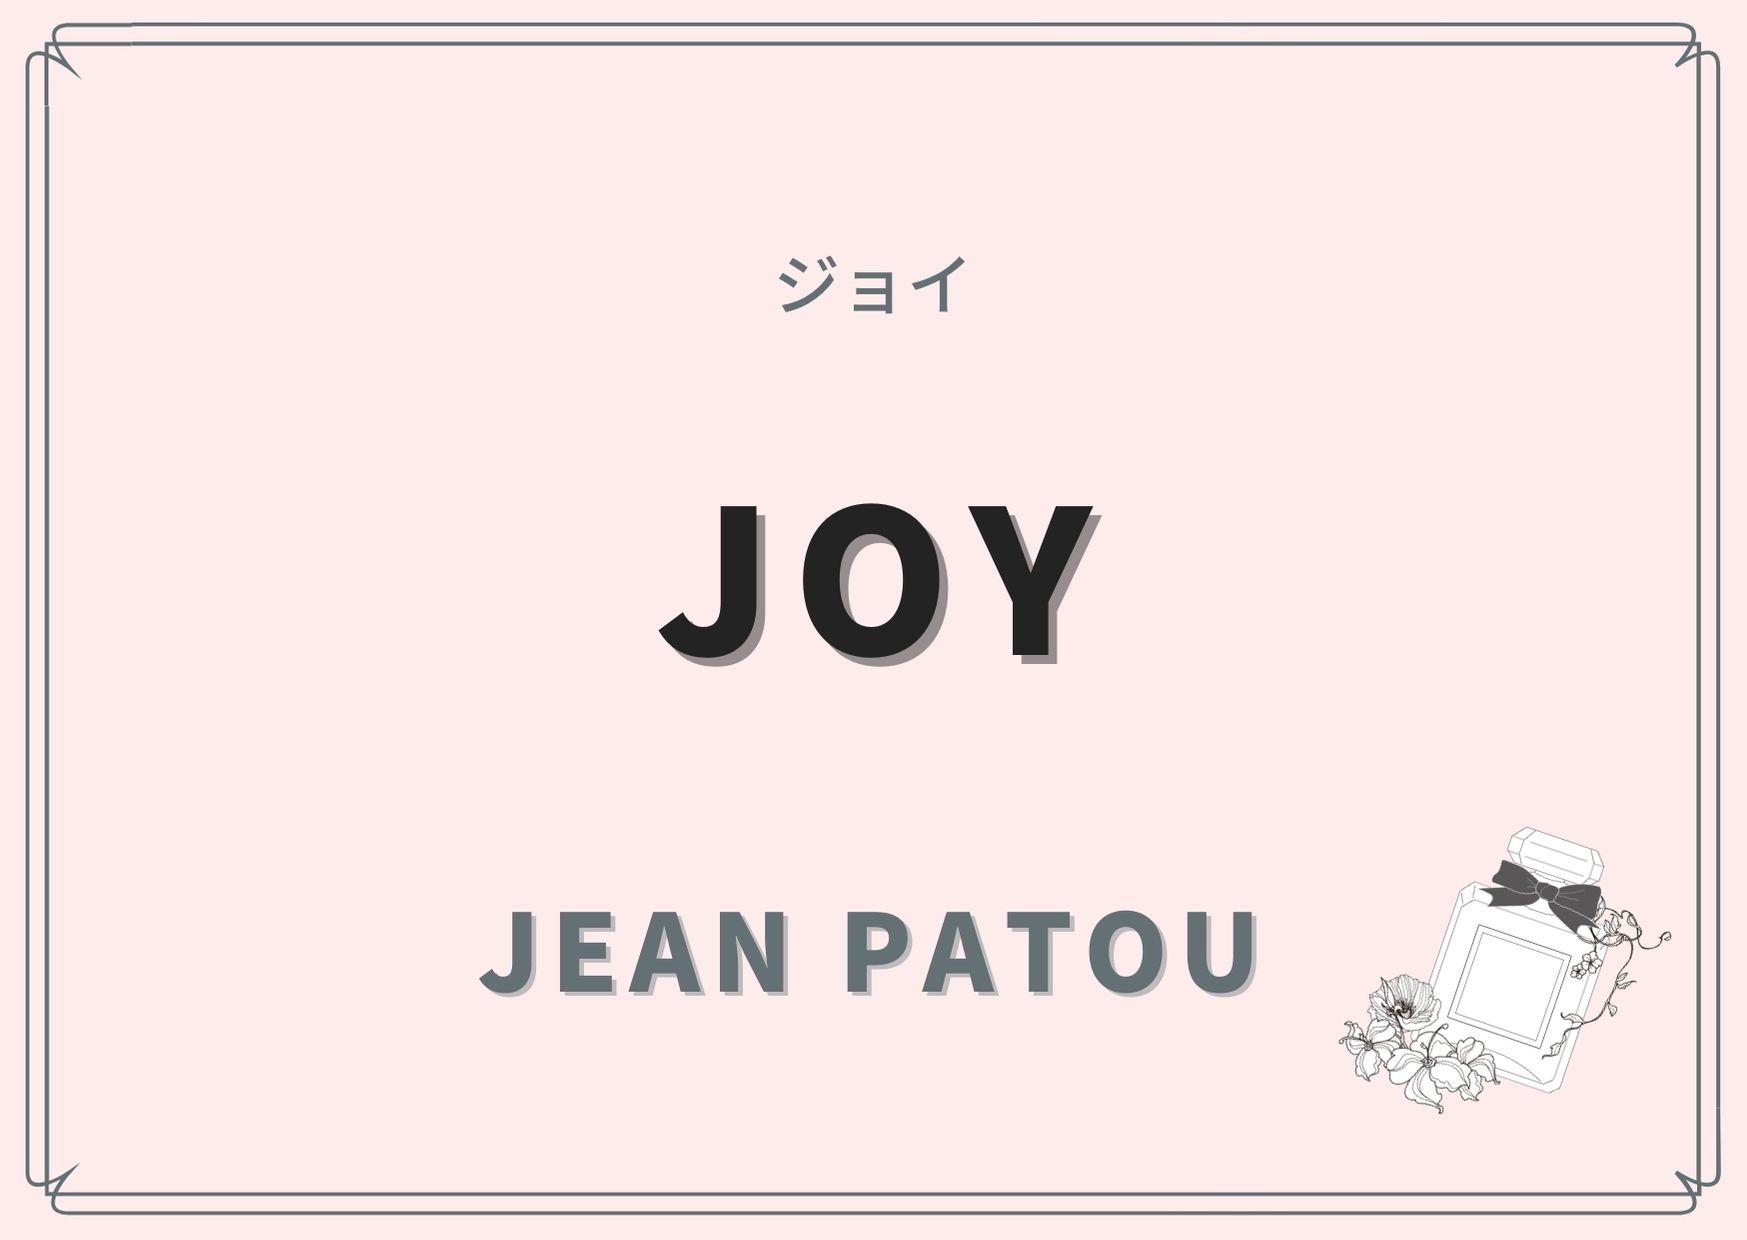 JOY(ジョイ)/JEAN PATOU(ジャン パトゥ)